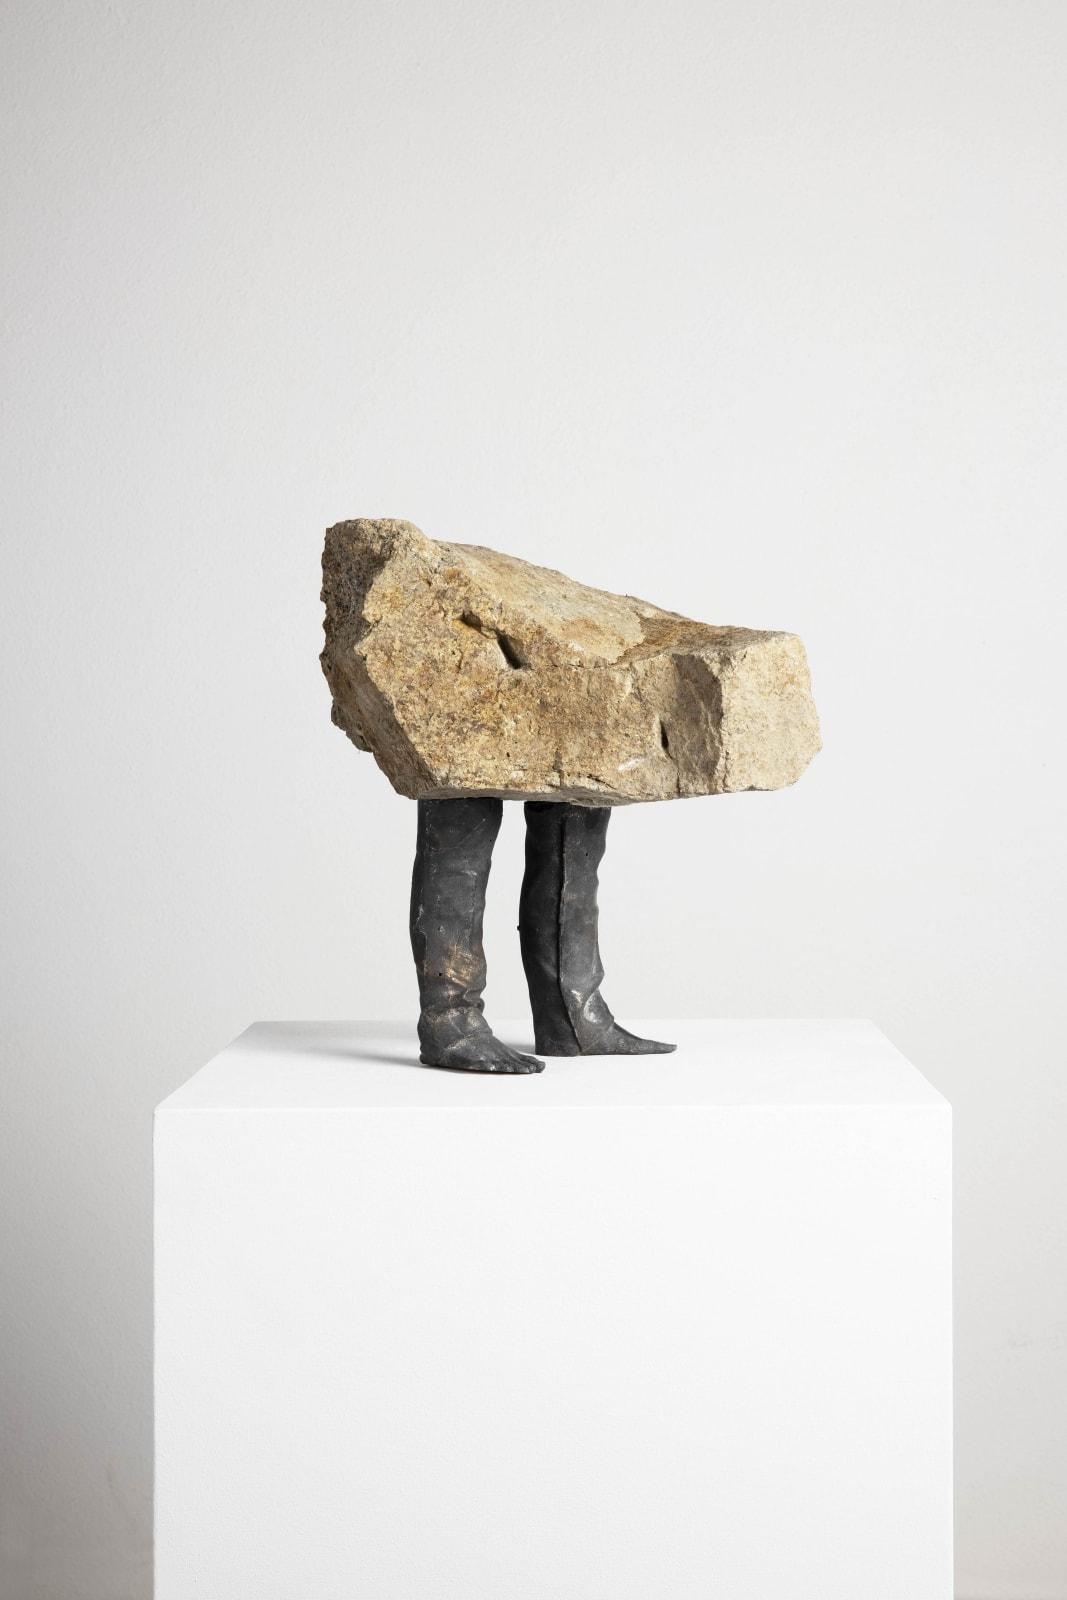 Erwin Wurm, Stone, 2021